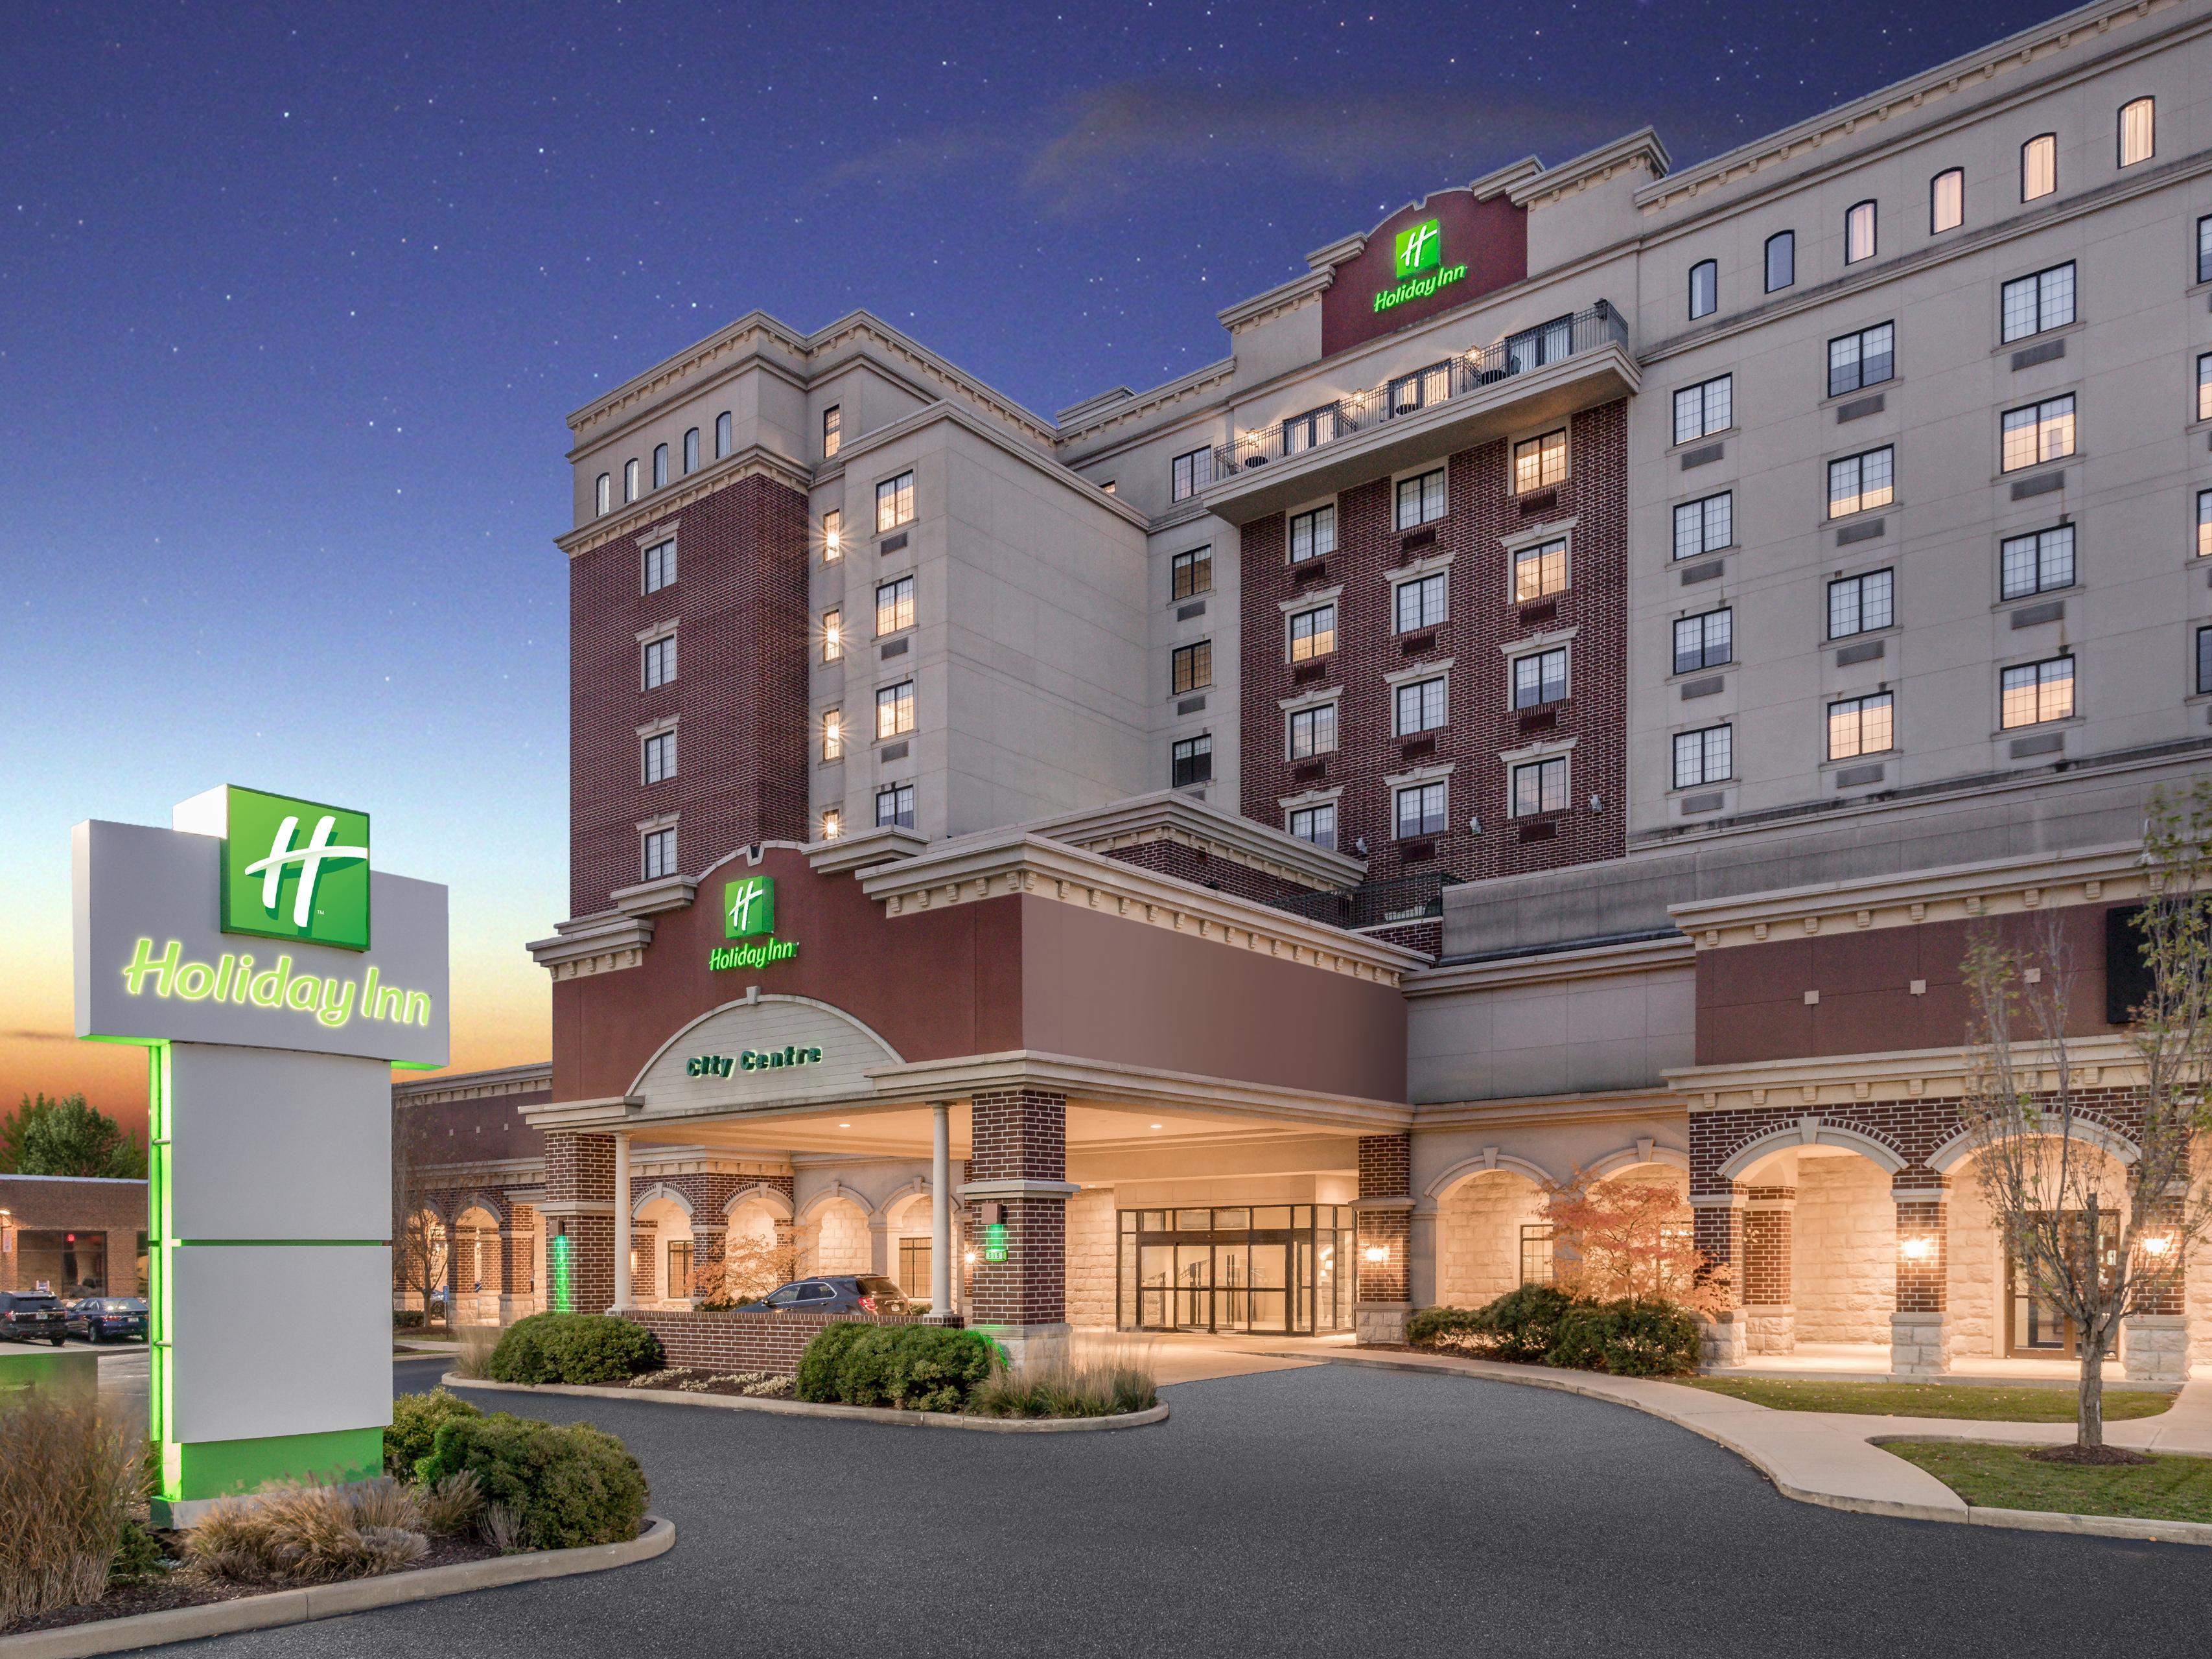 City Of Lafayette >> Hotels In Lafayette Indiana Holiday Inn Lafayette Ihg